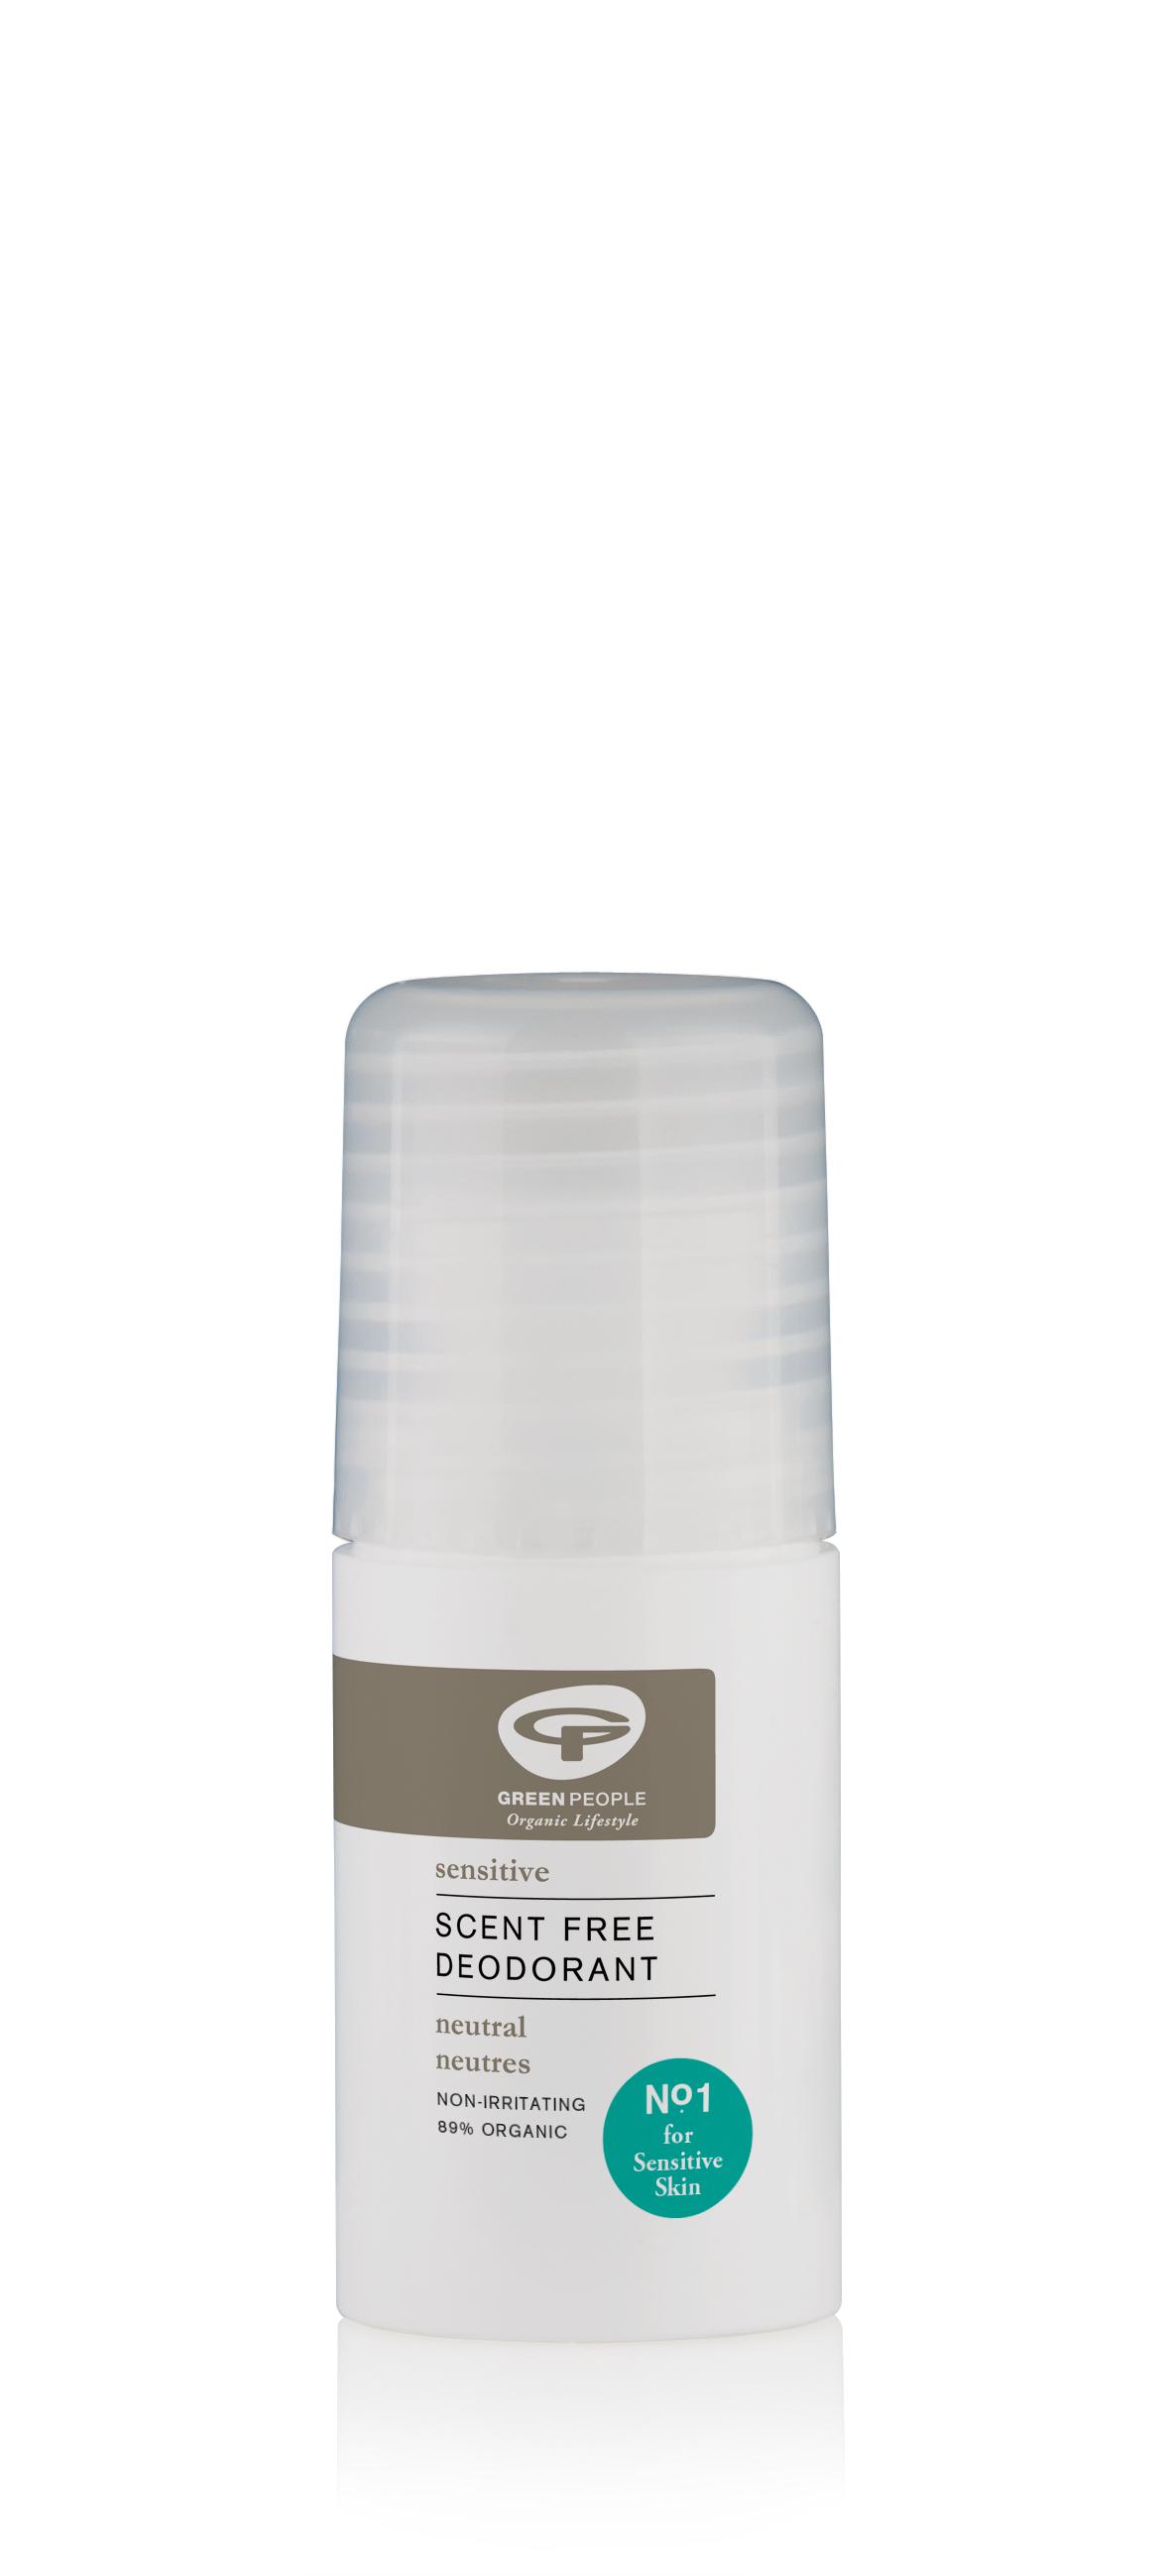 Scent Free Deodorant (Sensitive) 75ml